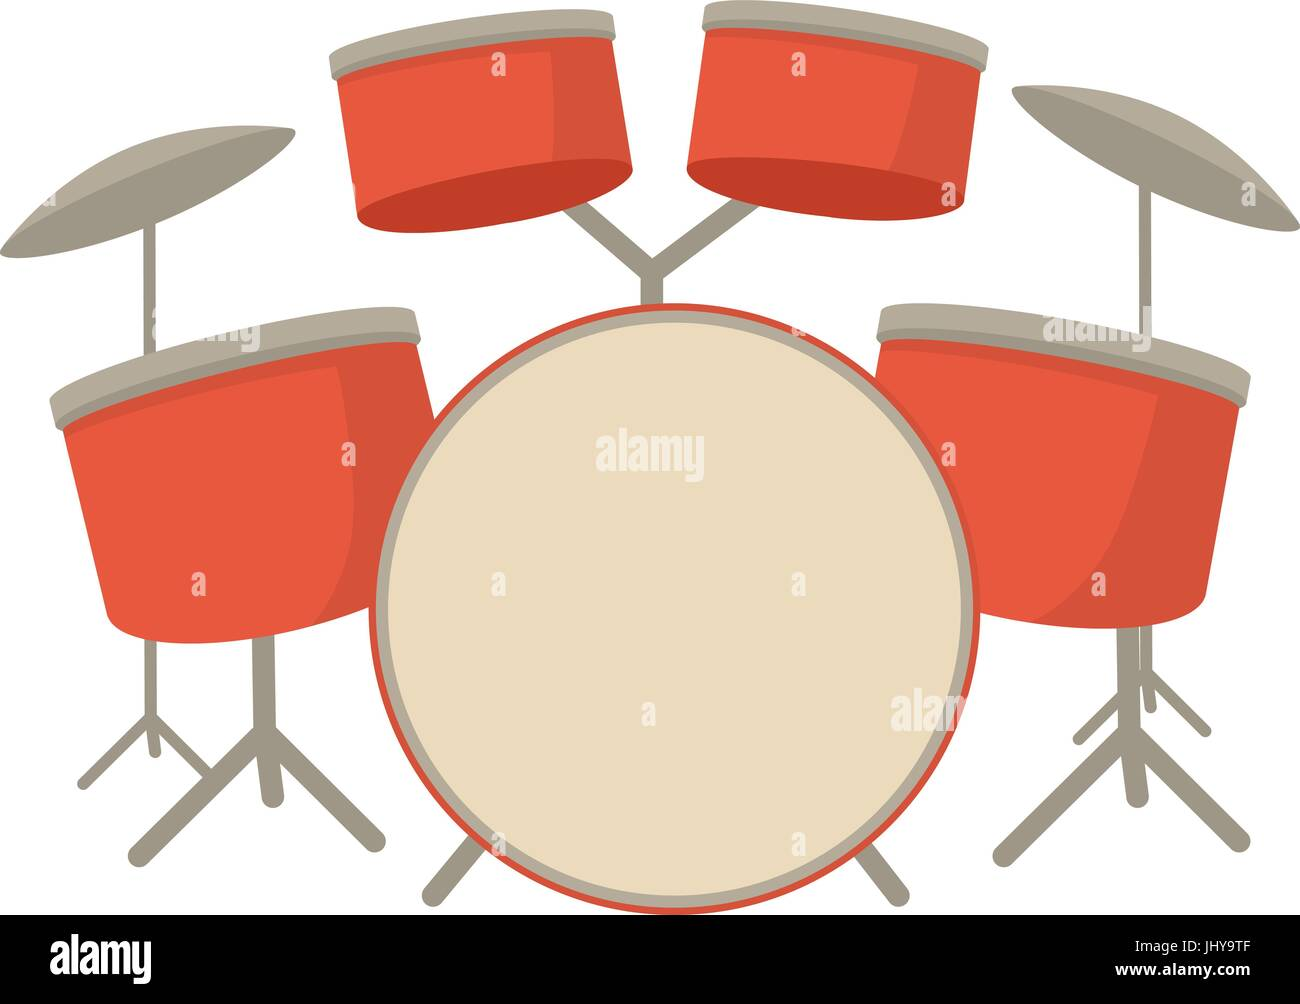 Drum Set Icon Cartoon Style Stock Vector Art Illustration Vector